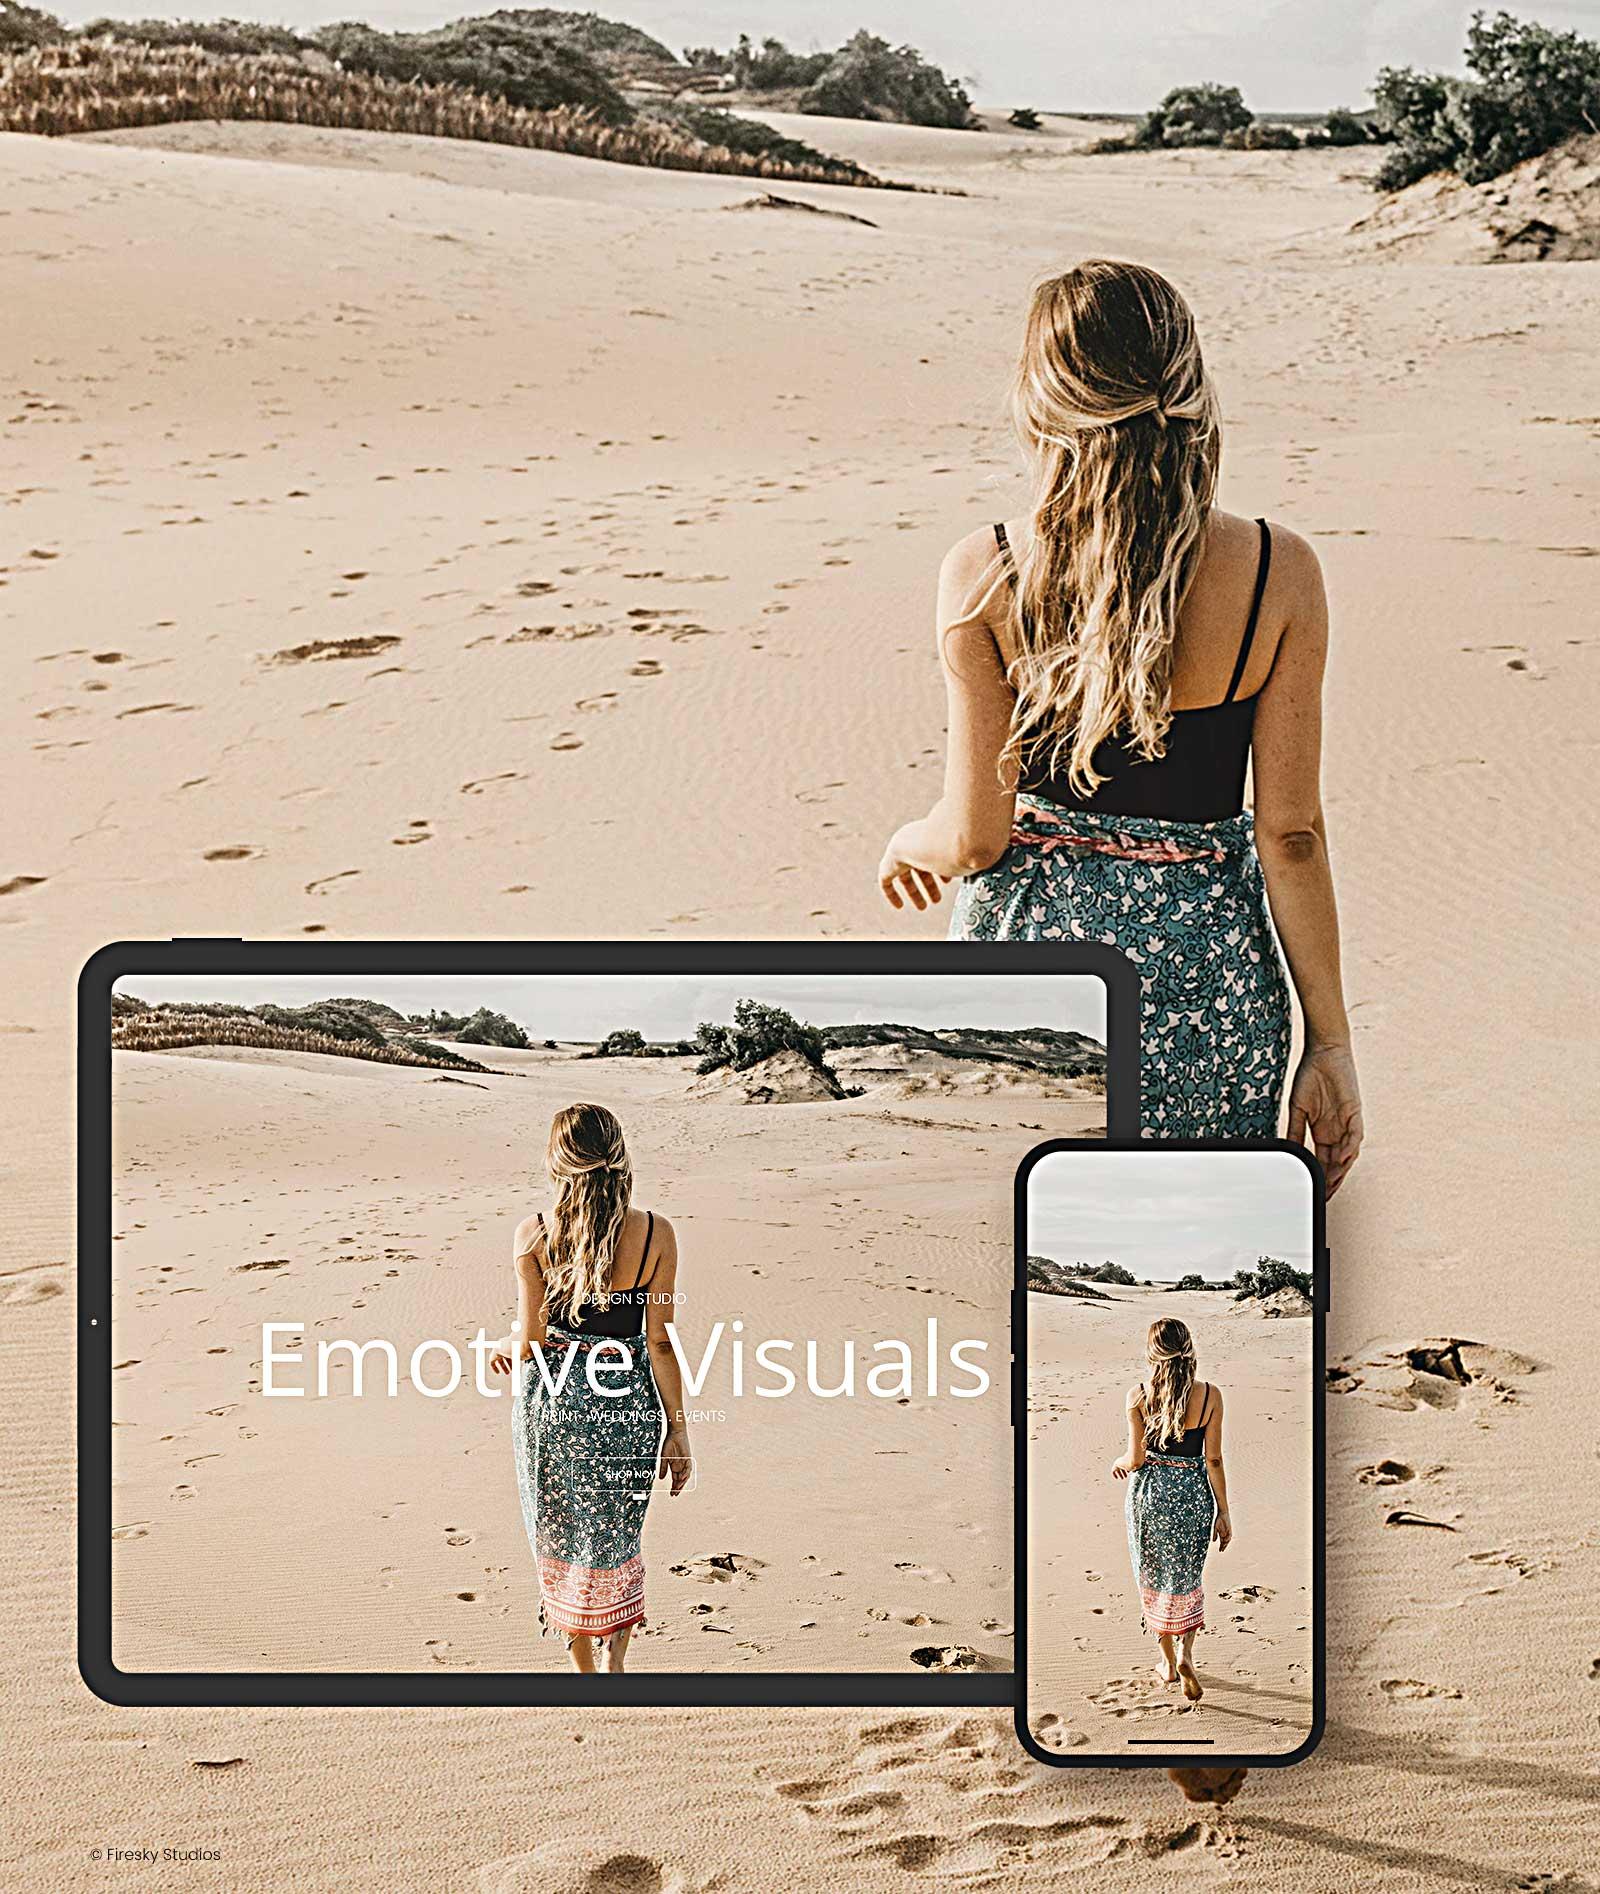 Using Emotive Visuals